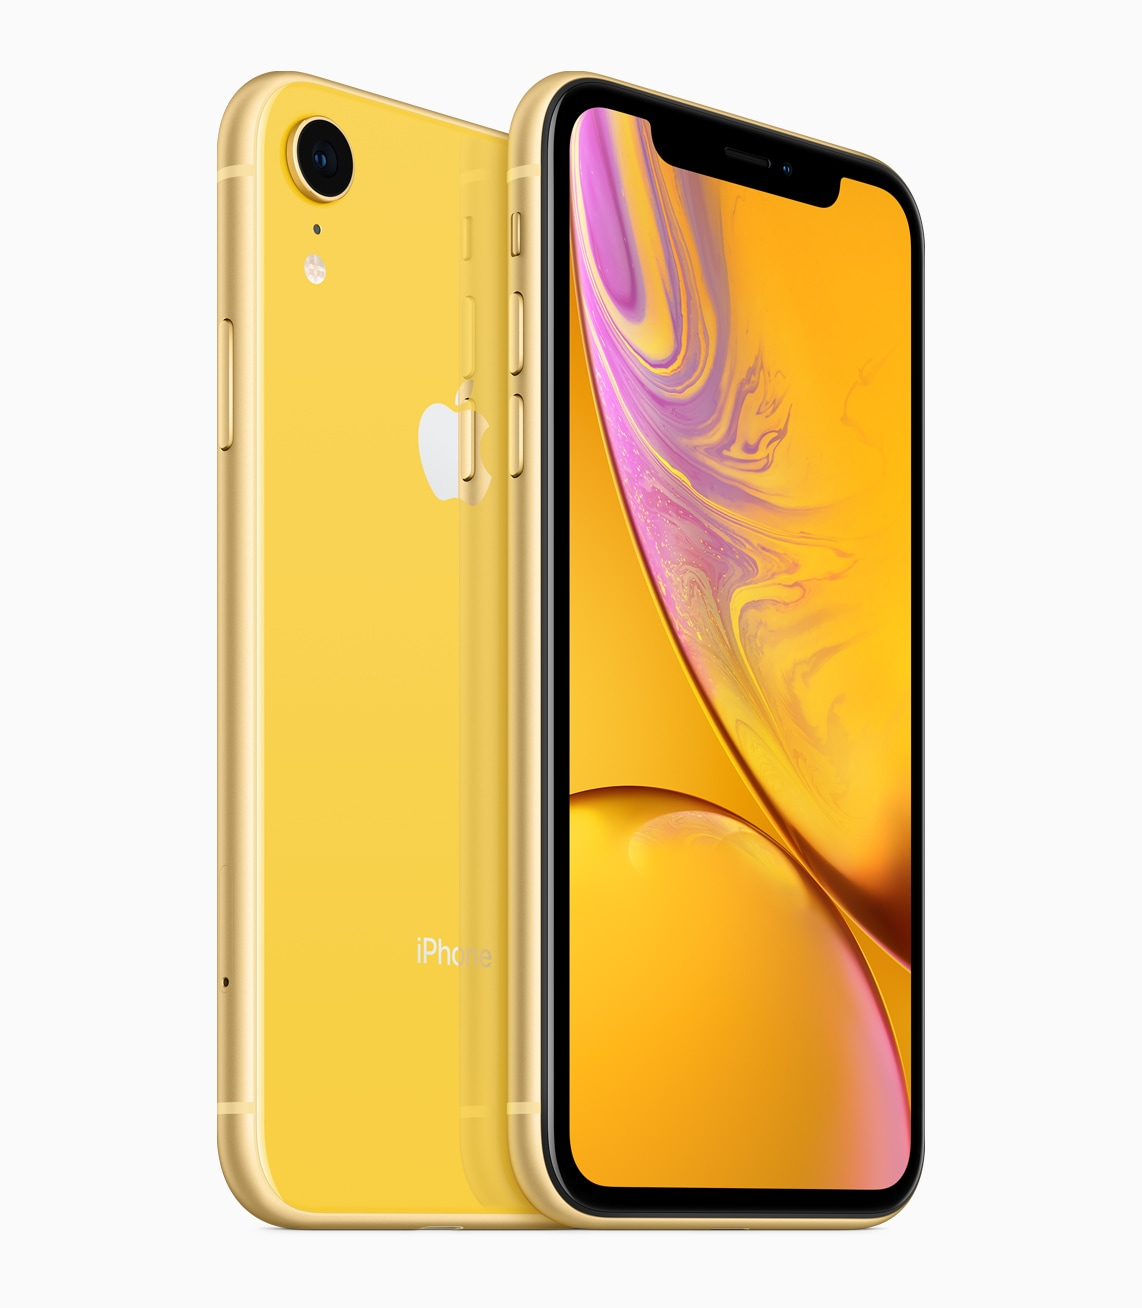 iPhone Xr amarelo de frente e de trás